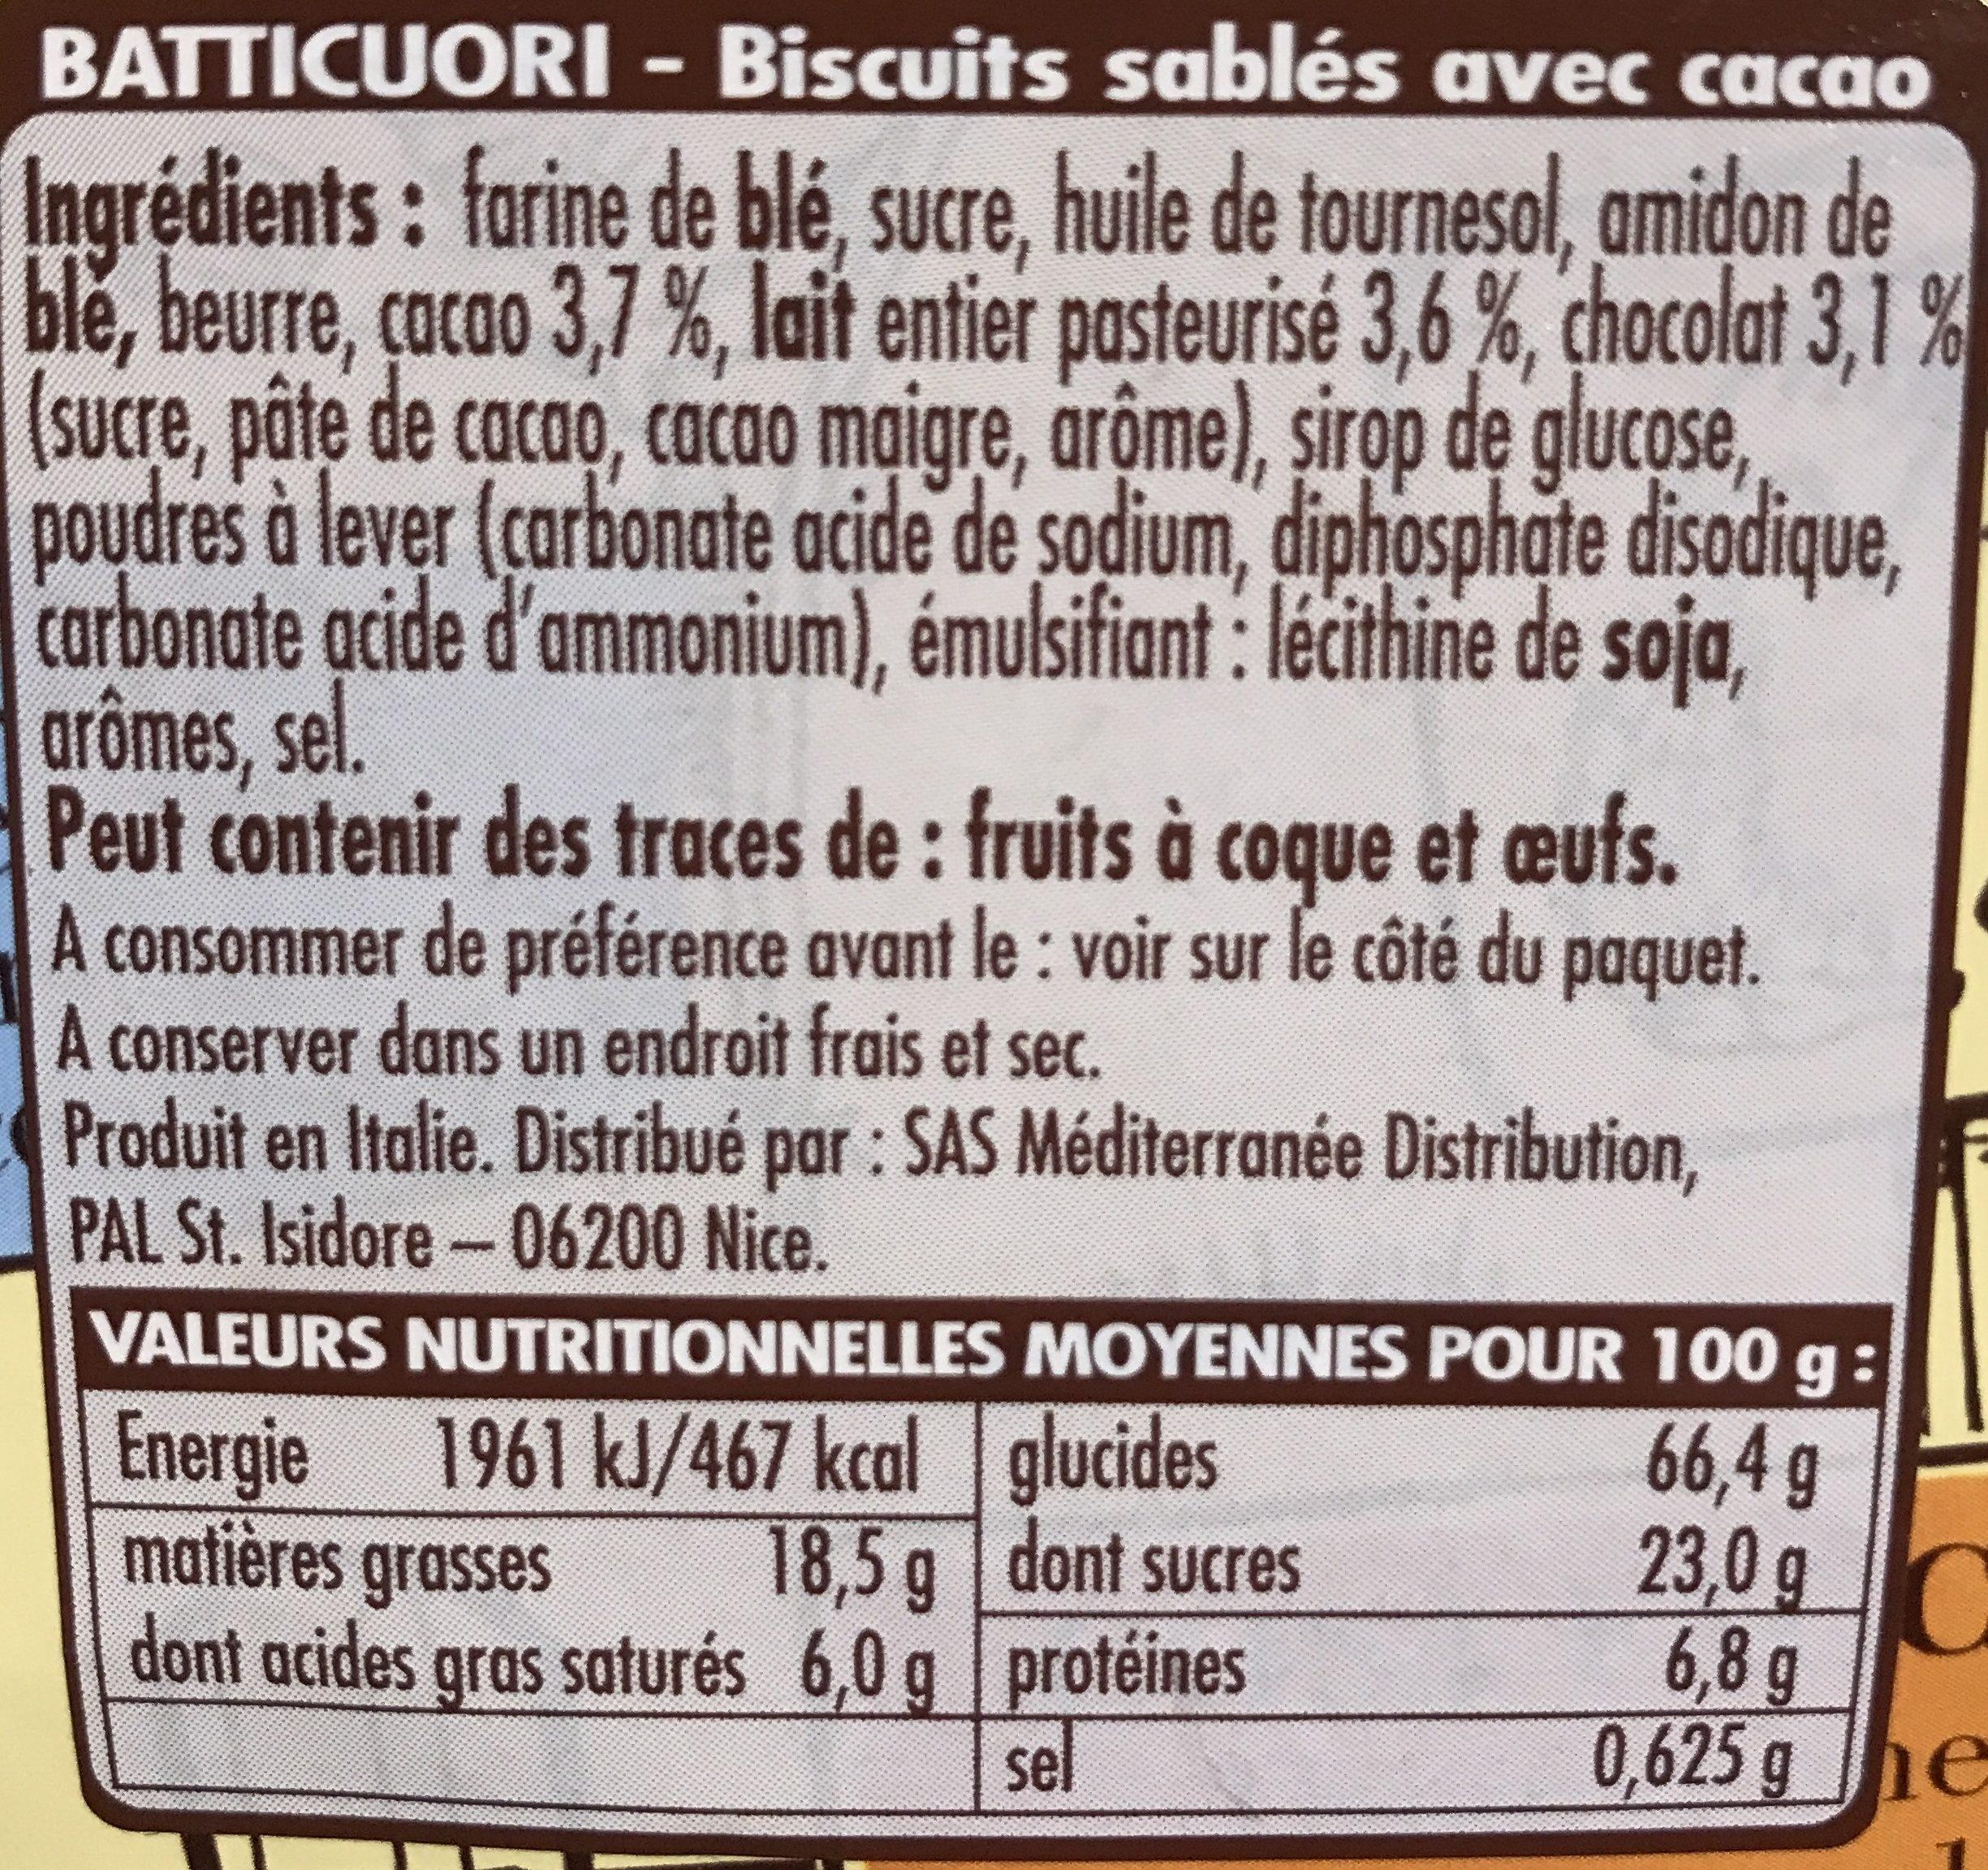 Biscuits Batticuori - Ingredientes